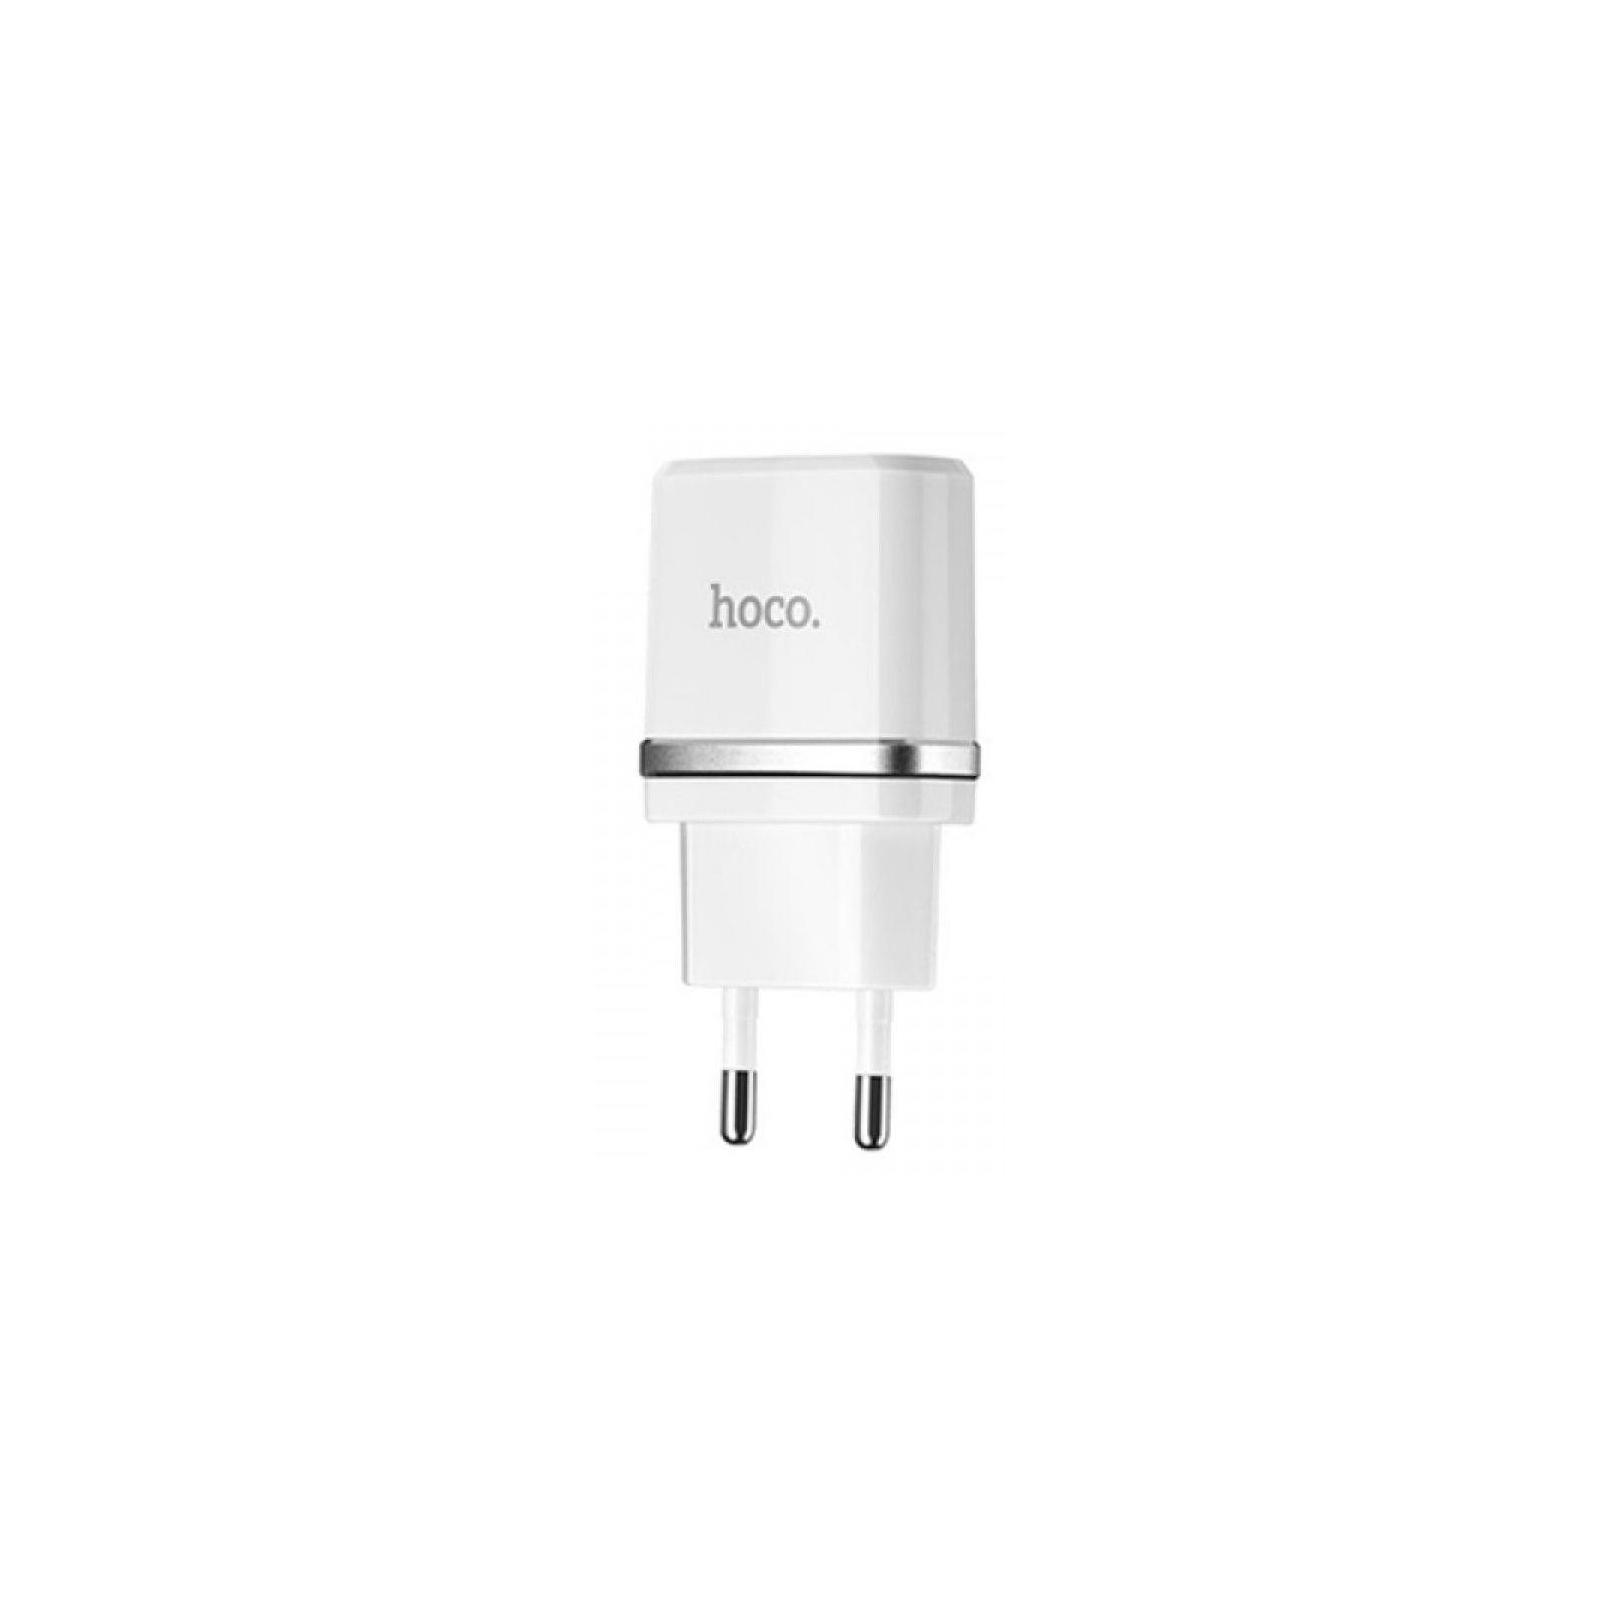 Зарядное устройство HOCO C12 2*USB, 2.4A, White (62704)